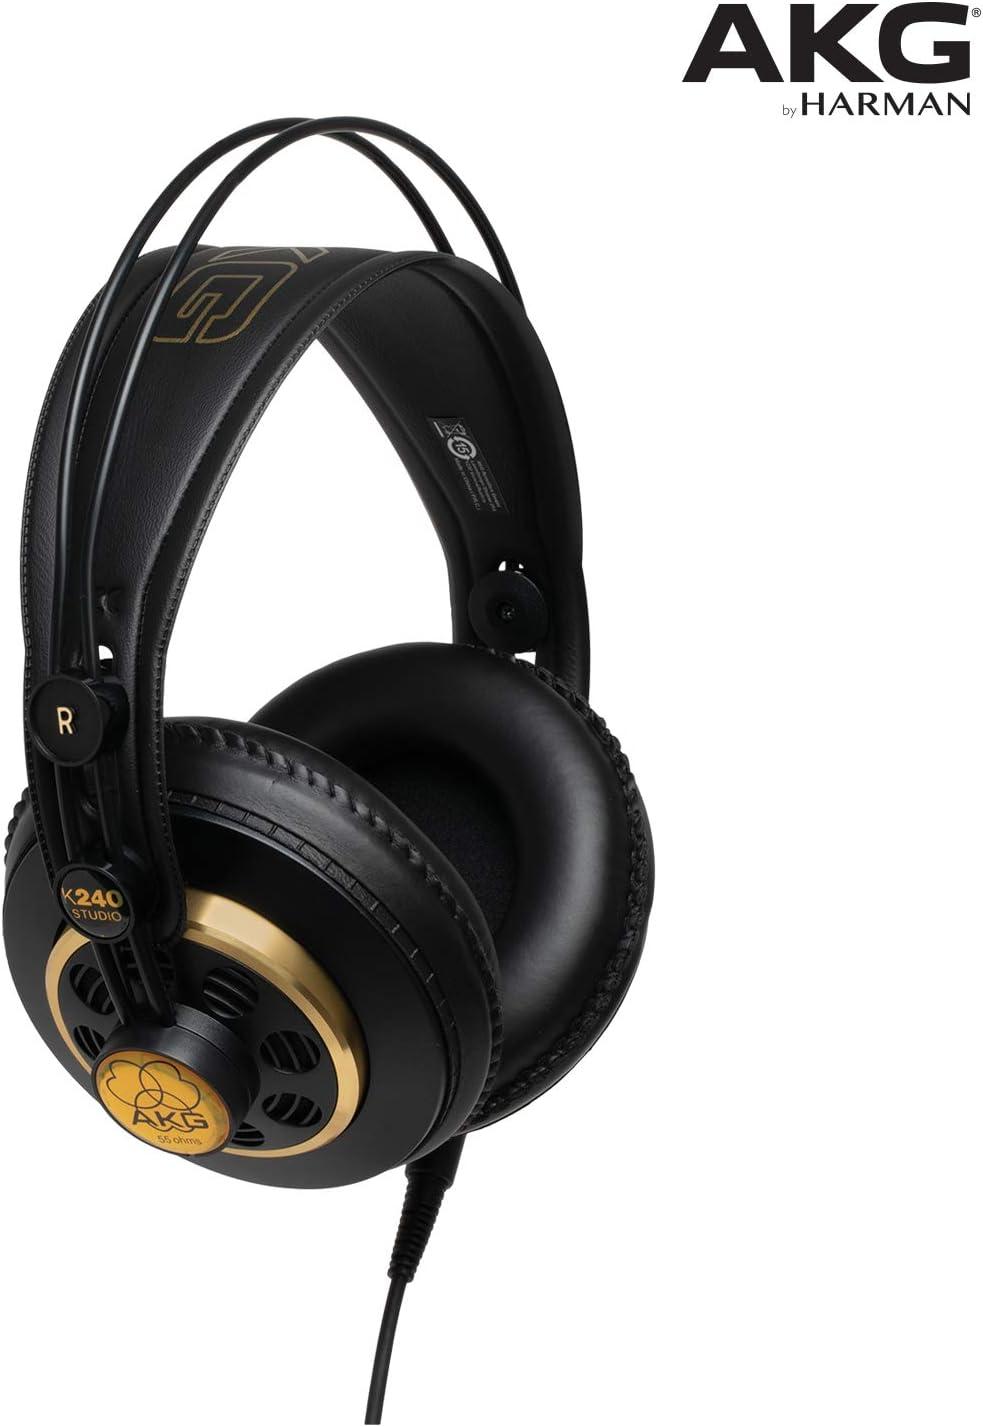 10 Best Studio Headphones Under 100 Dollars On Earth 1